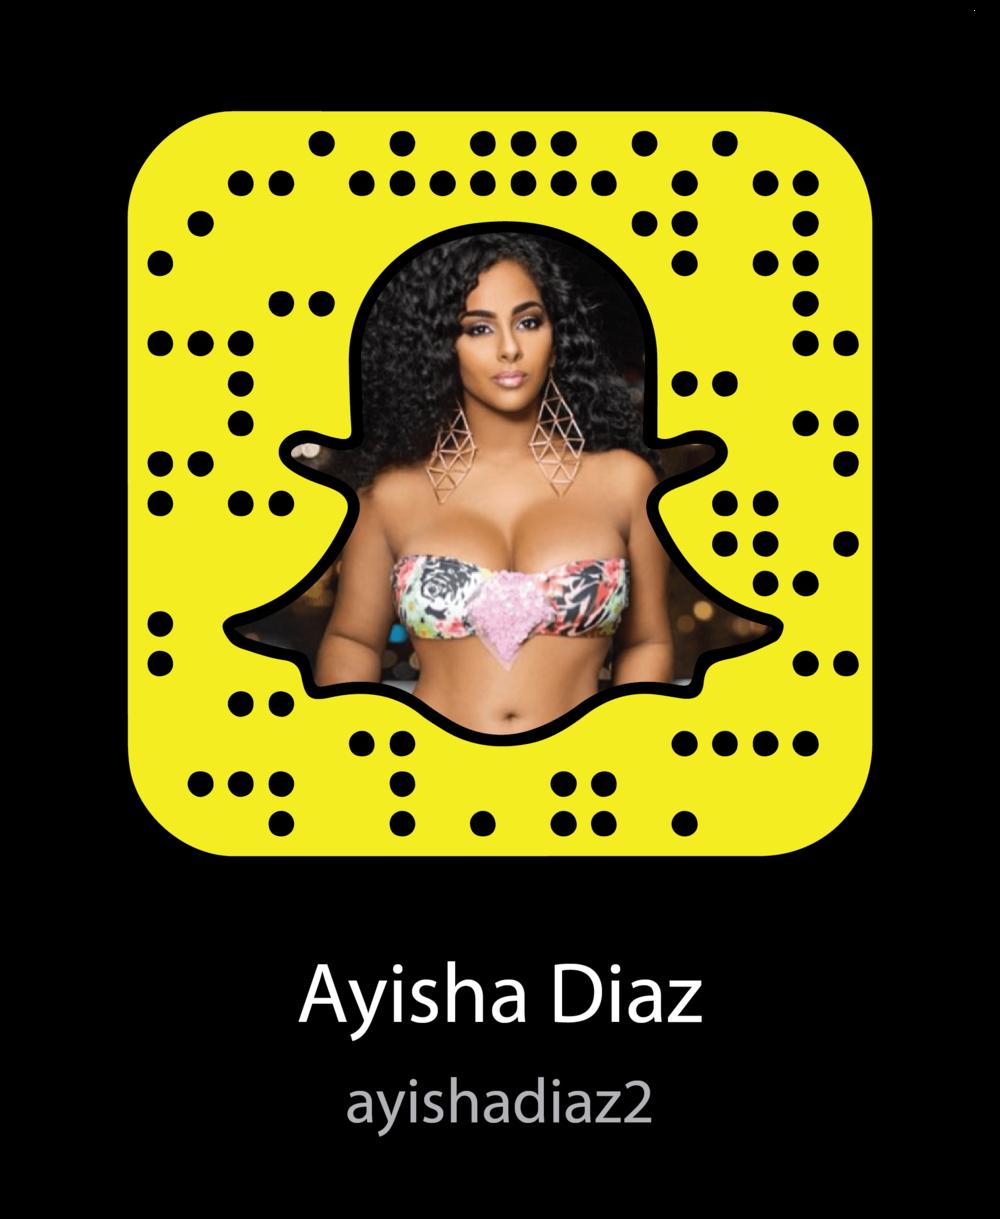 ayisha-diaz-sexy-snapchat-snapcode